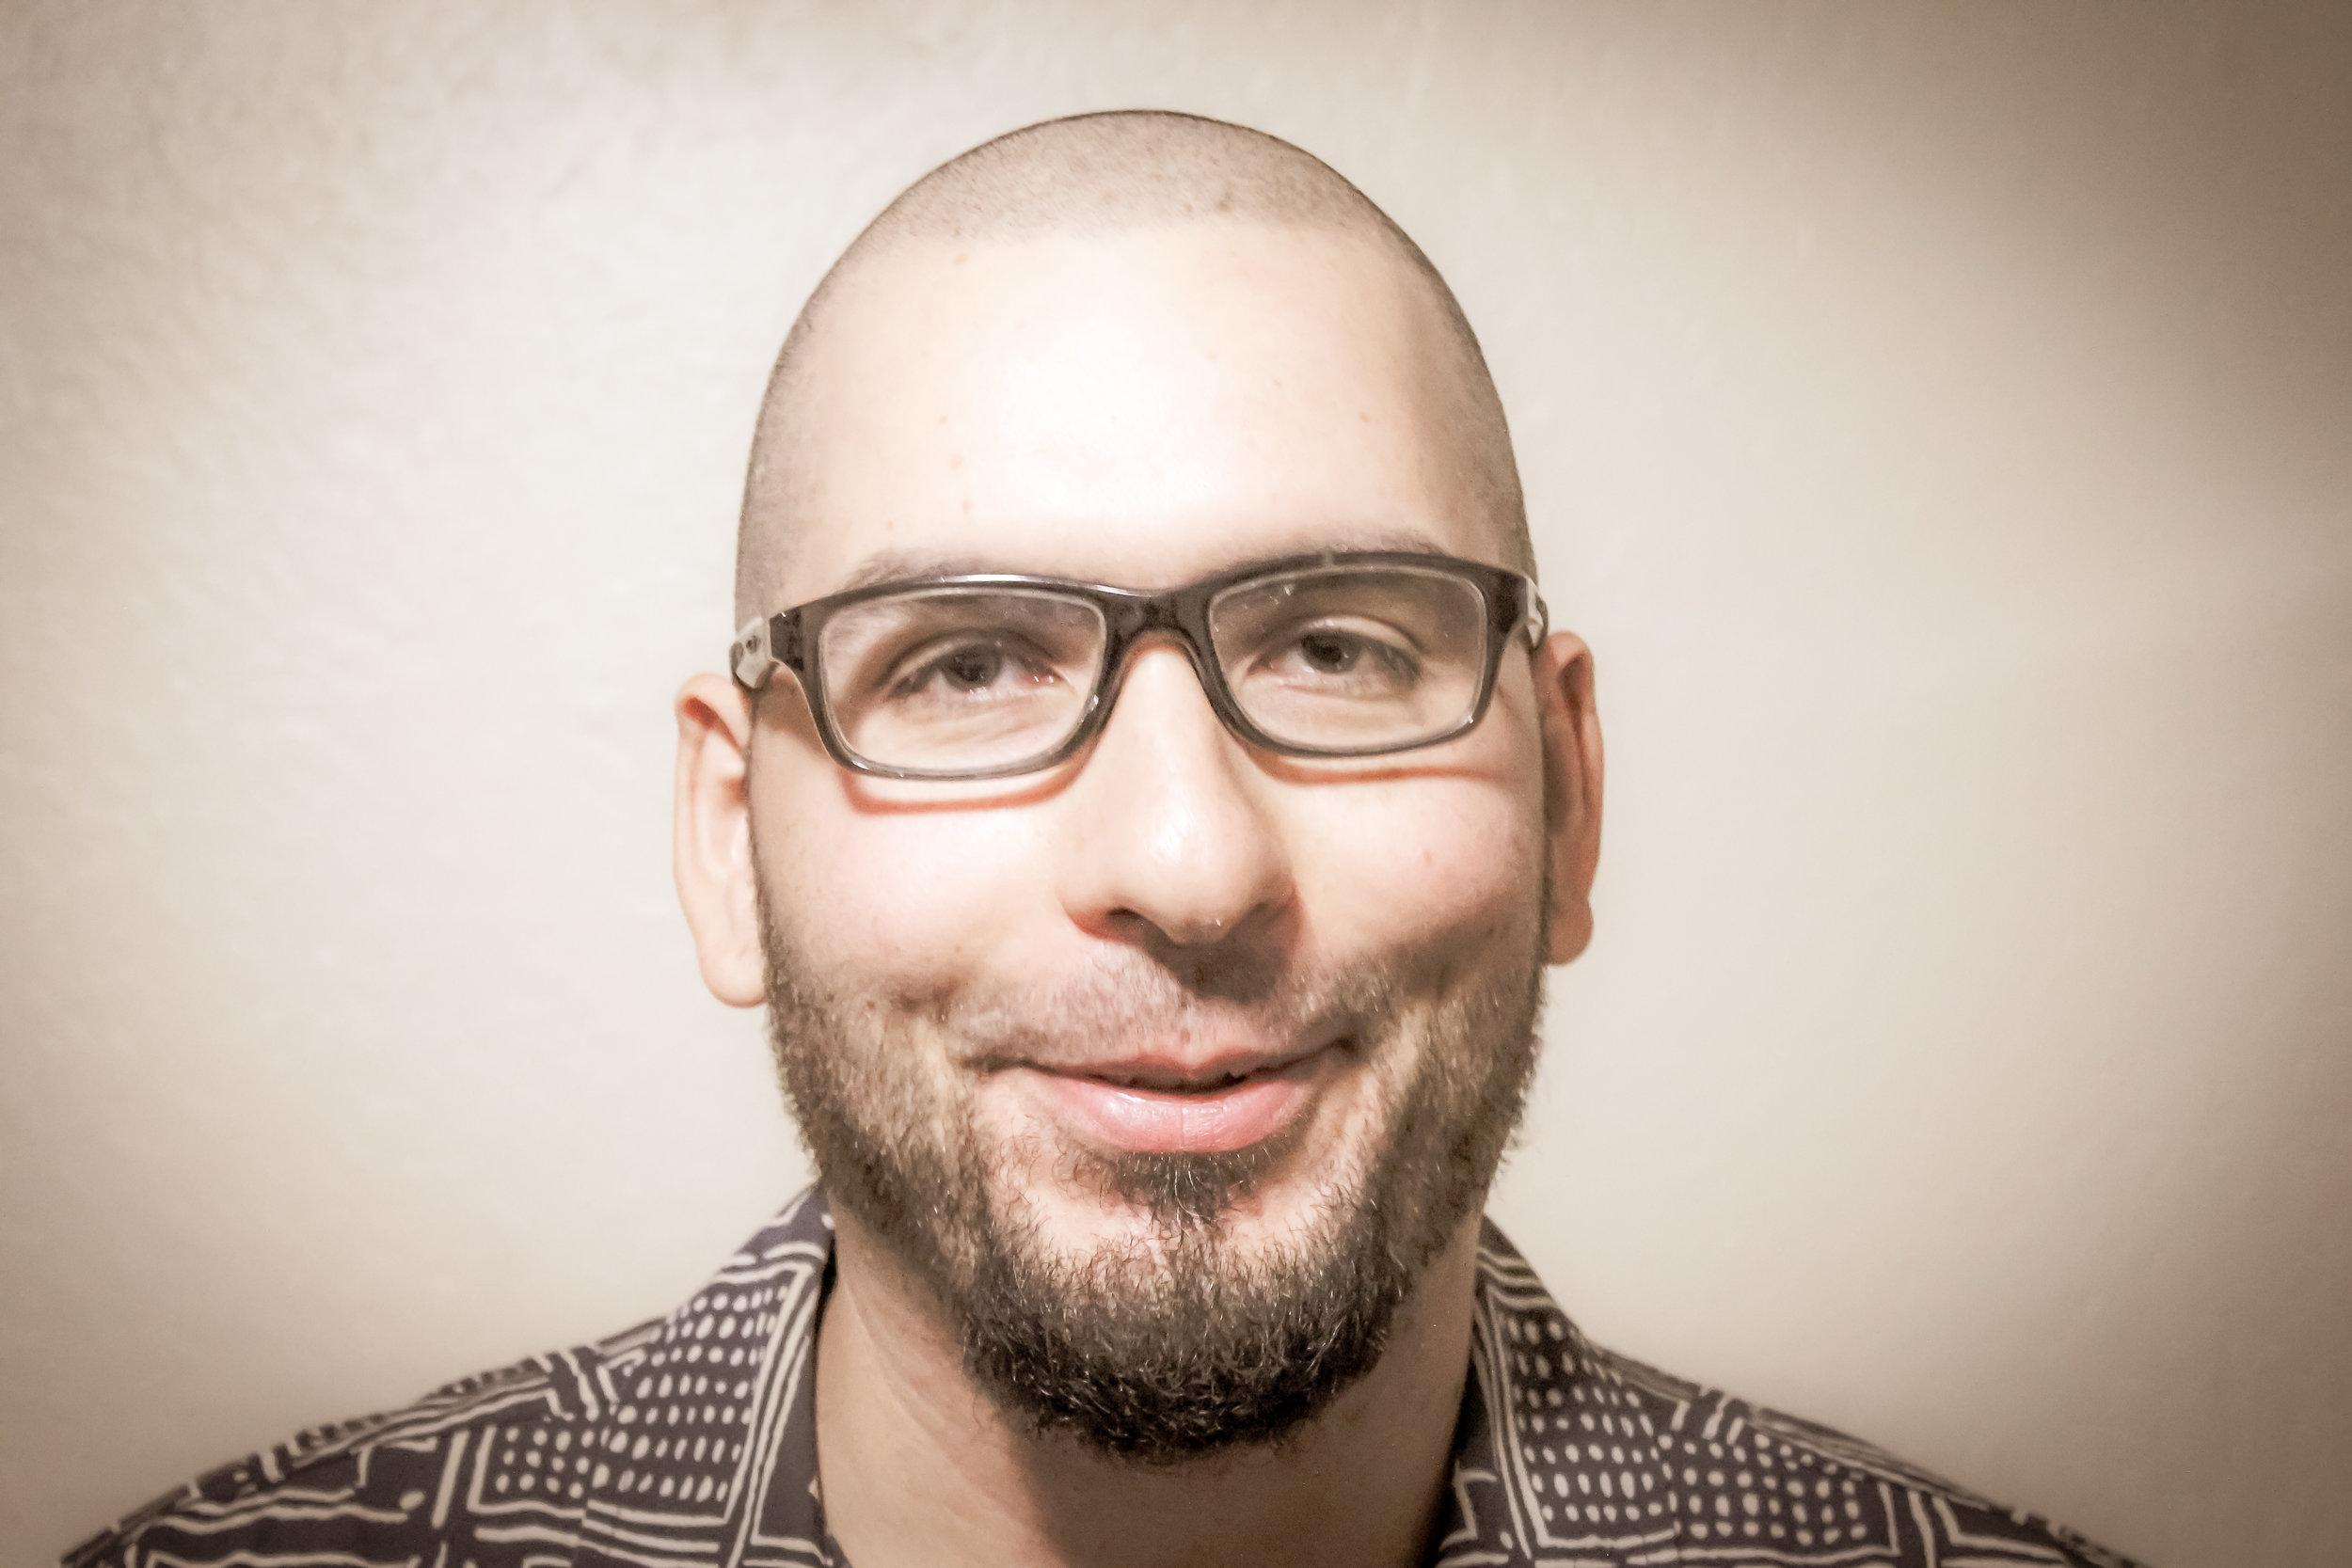 DANNY ACOSTA:-Writer-Photographer-Producer-Radio Host - CREDITS: Maxim, USA Today Sports, FOX Sports, Vice, Bleacher Report, SiriusXM, ESPN, and more.